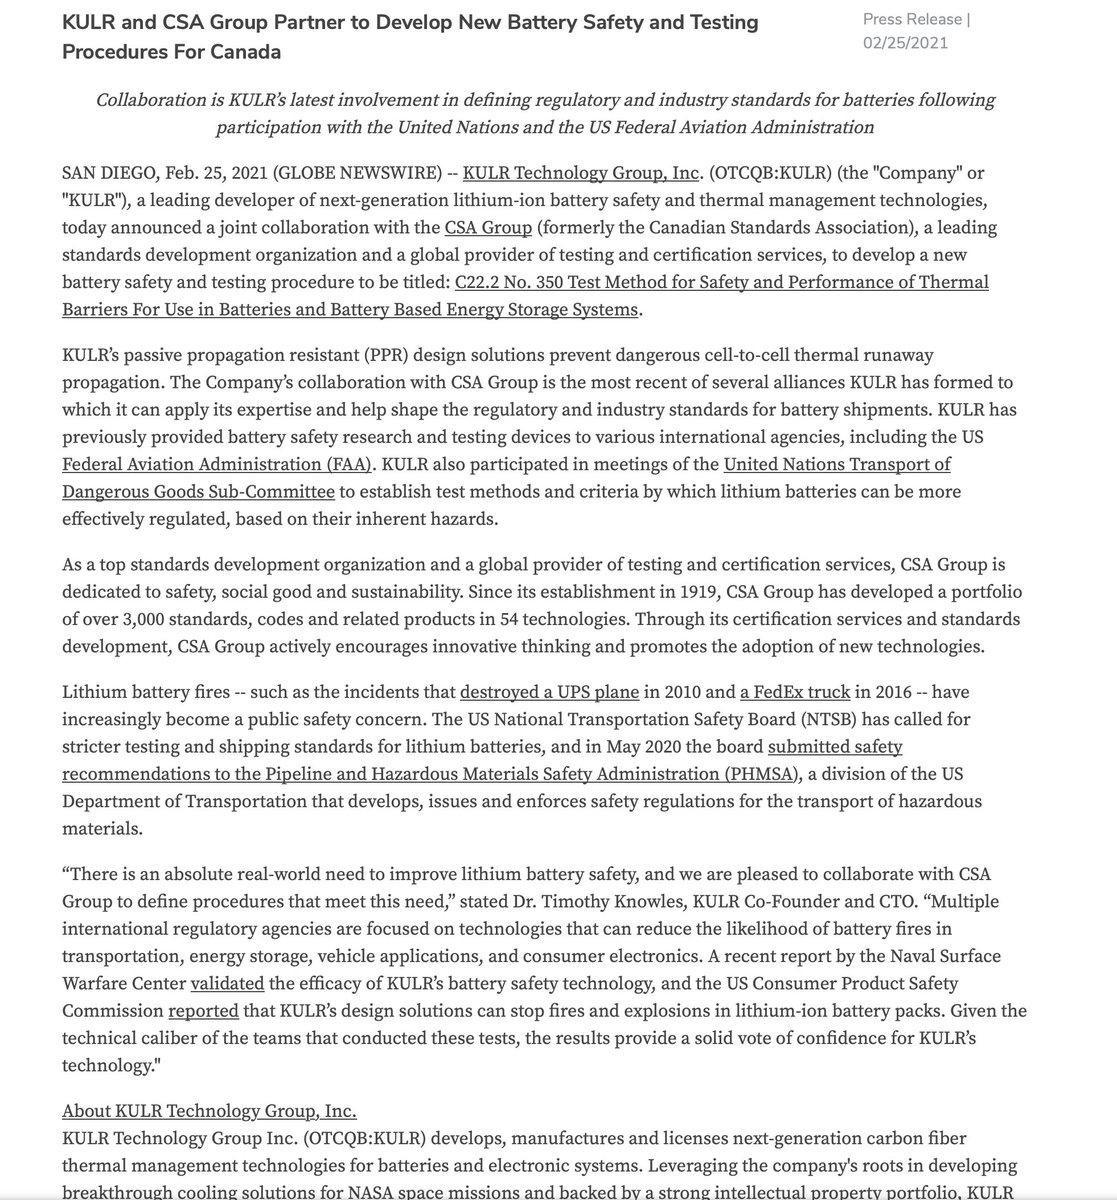 $KULR New Battery Safety and Testing   #wsj #nytimes #business #reuters #IHub_StockPosts #forbes #marketwatch #cnn #bet #foxnews #latimes #Benzinga #Crainschicago #usatoday #ESPN #barronsonline #WGN #IBDinvestors #cnnmoneyinvest #NASDAQ